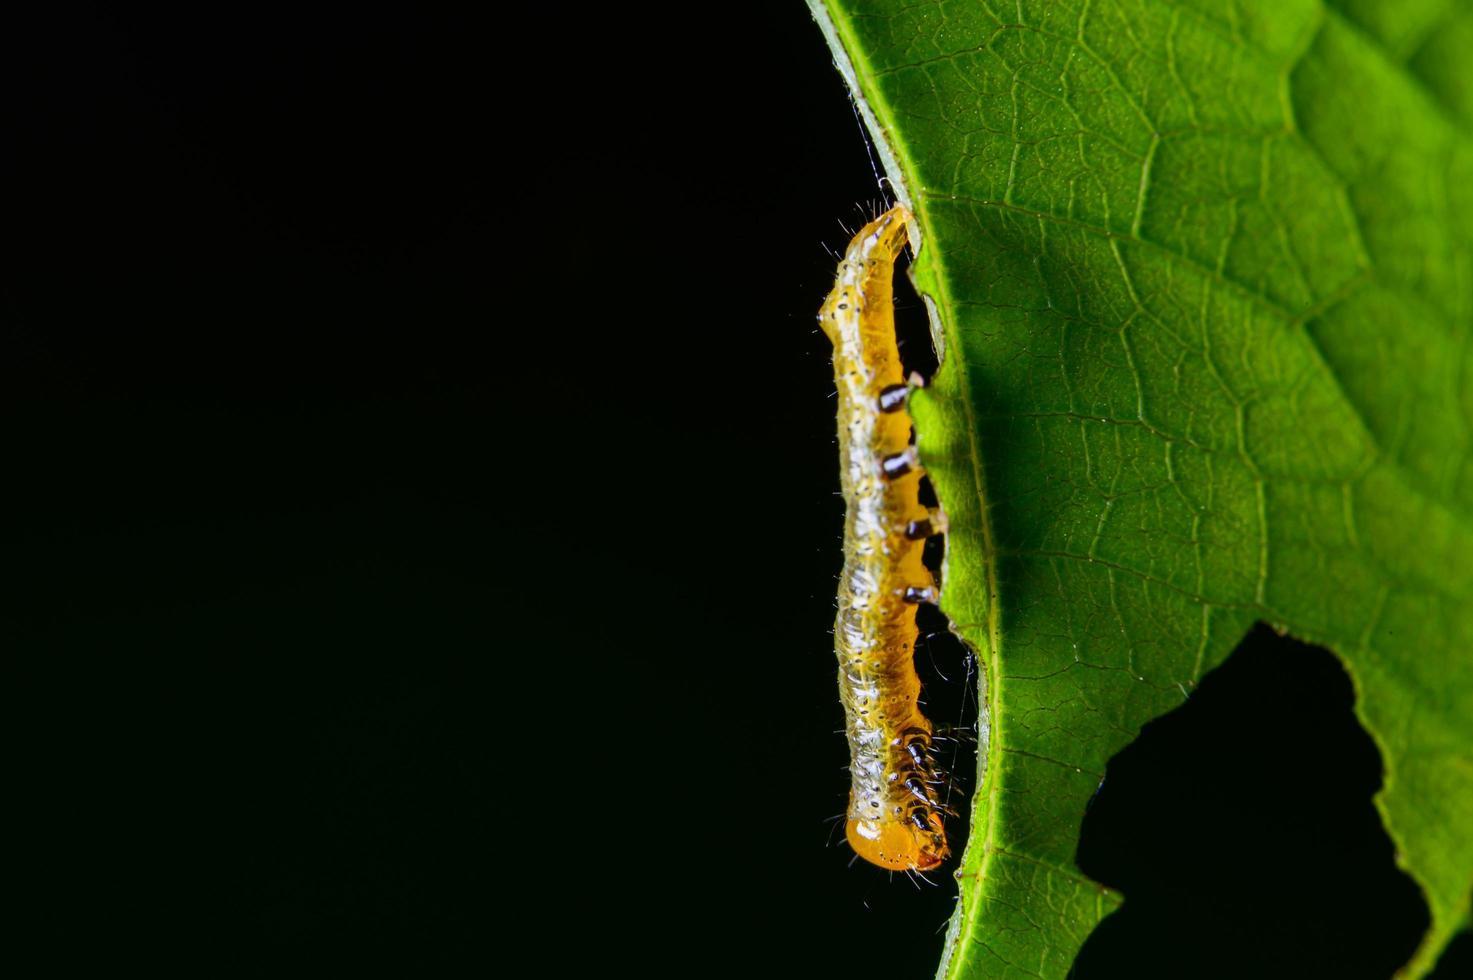 lagarta em uma folha foto